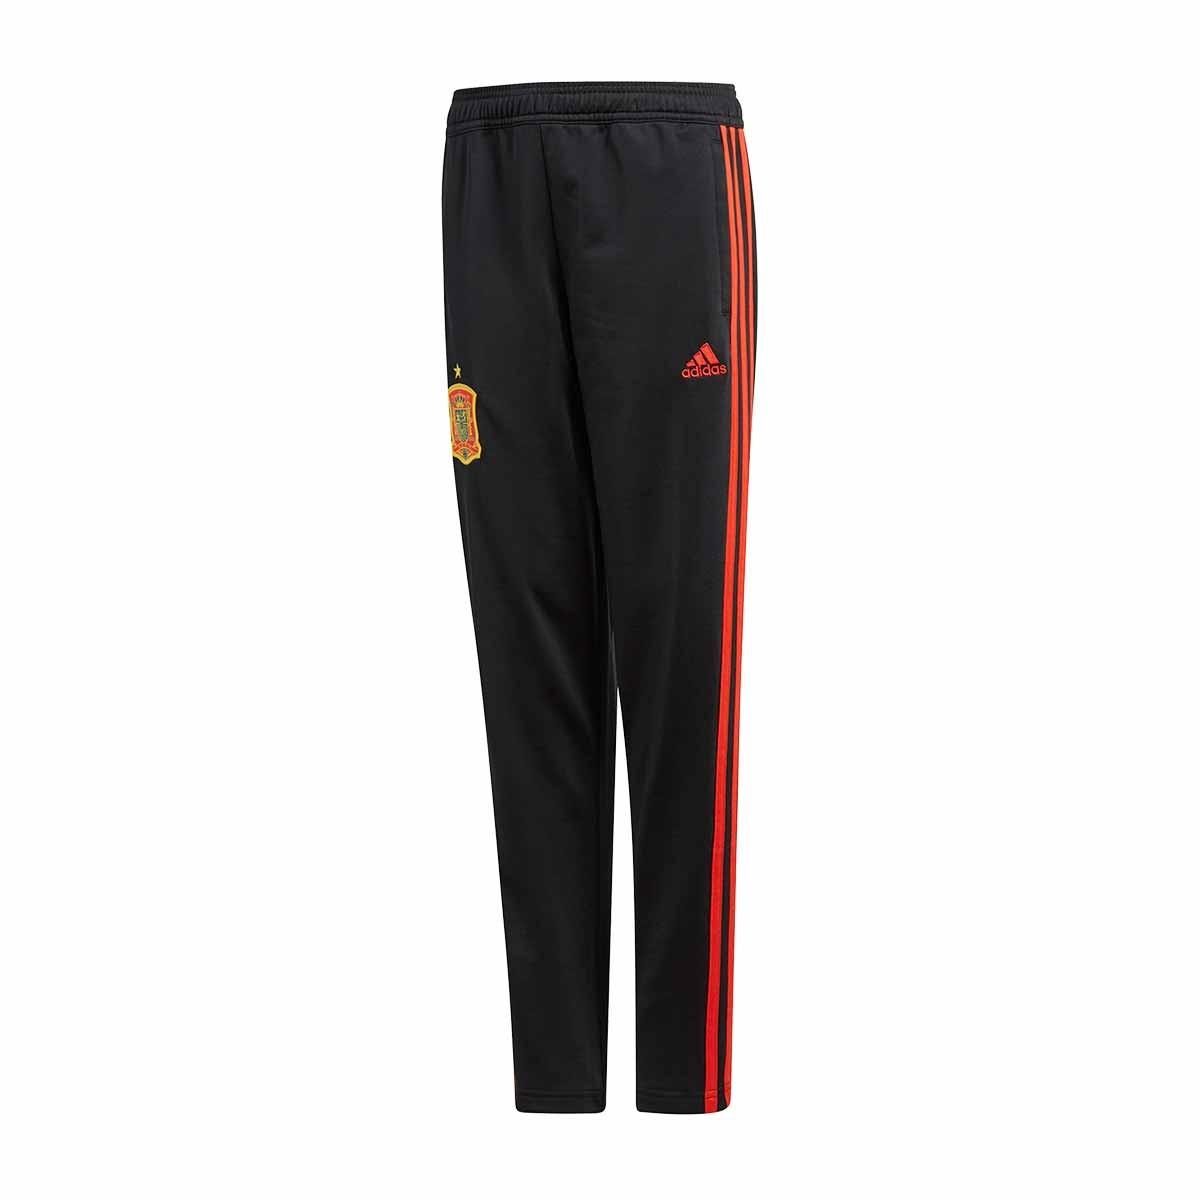 21cea8d6594a Long pants adidas Kids Training Spain 2017-2018 Black-Red - Tienda ...